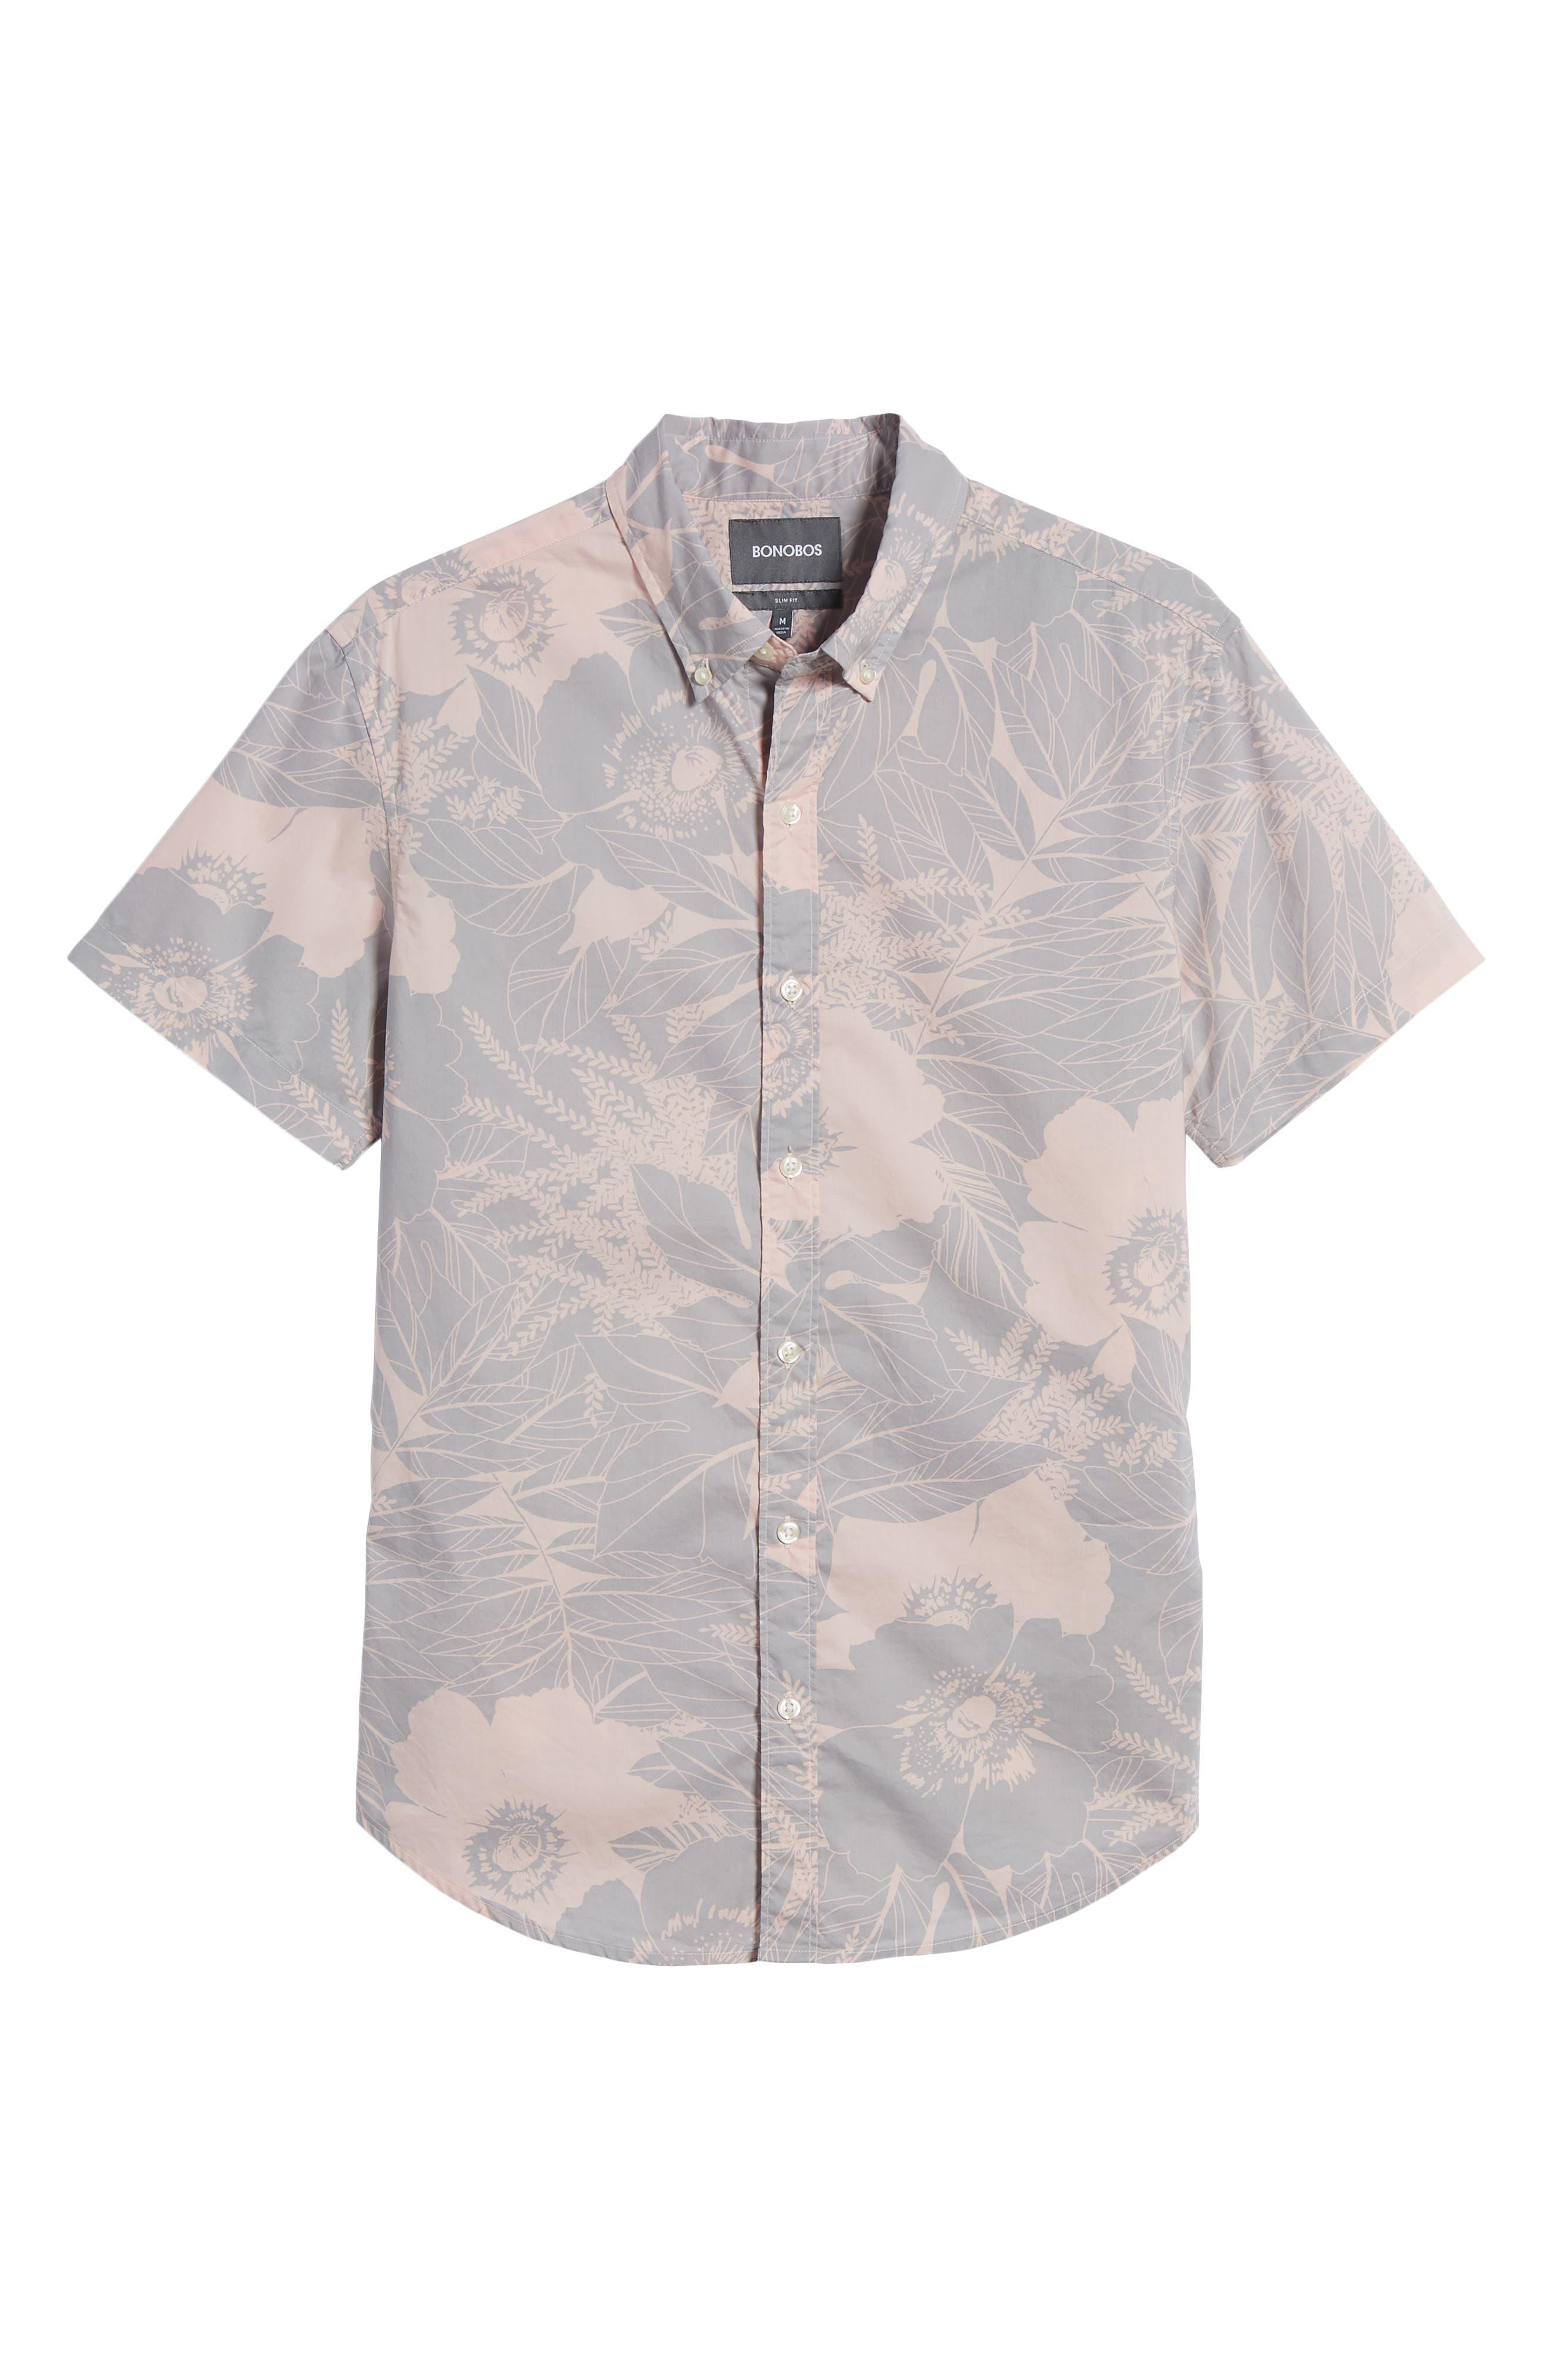 Riviera Slim Fit Floral Print Sport Shirt,                             Alternate thumbnail 6, color,                             LINEAR FLORAL - SKIVVY PINK